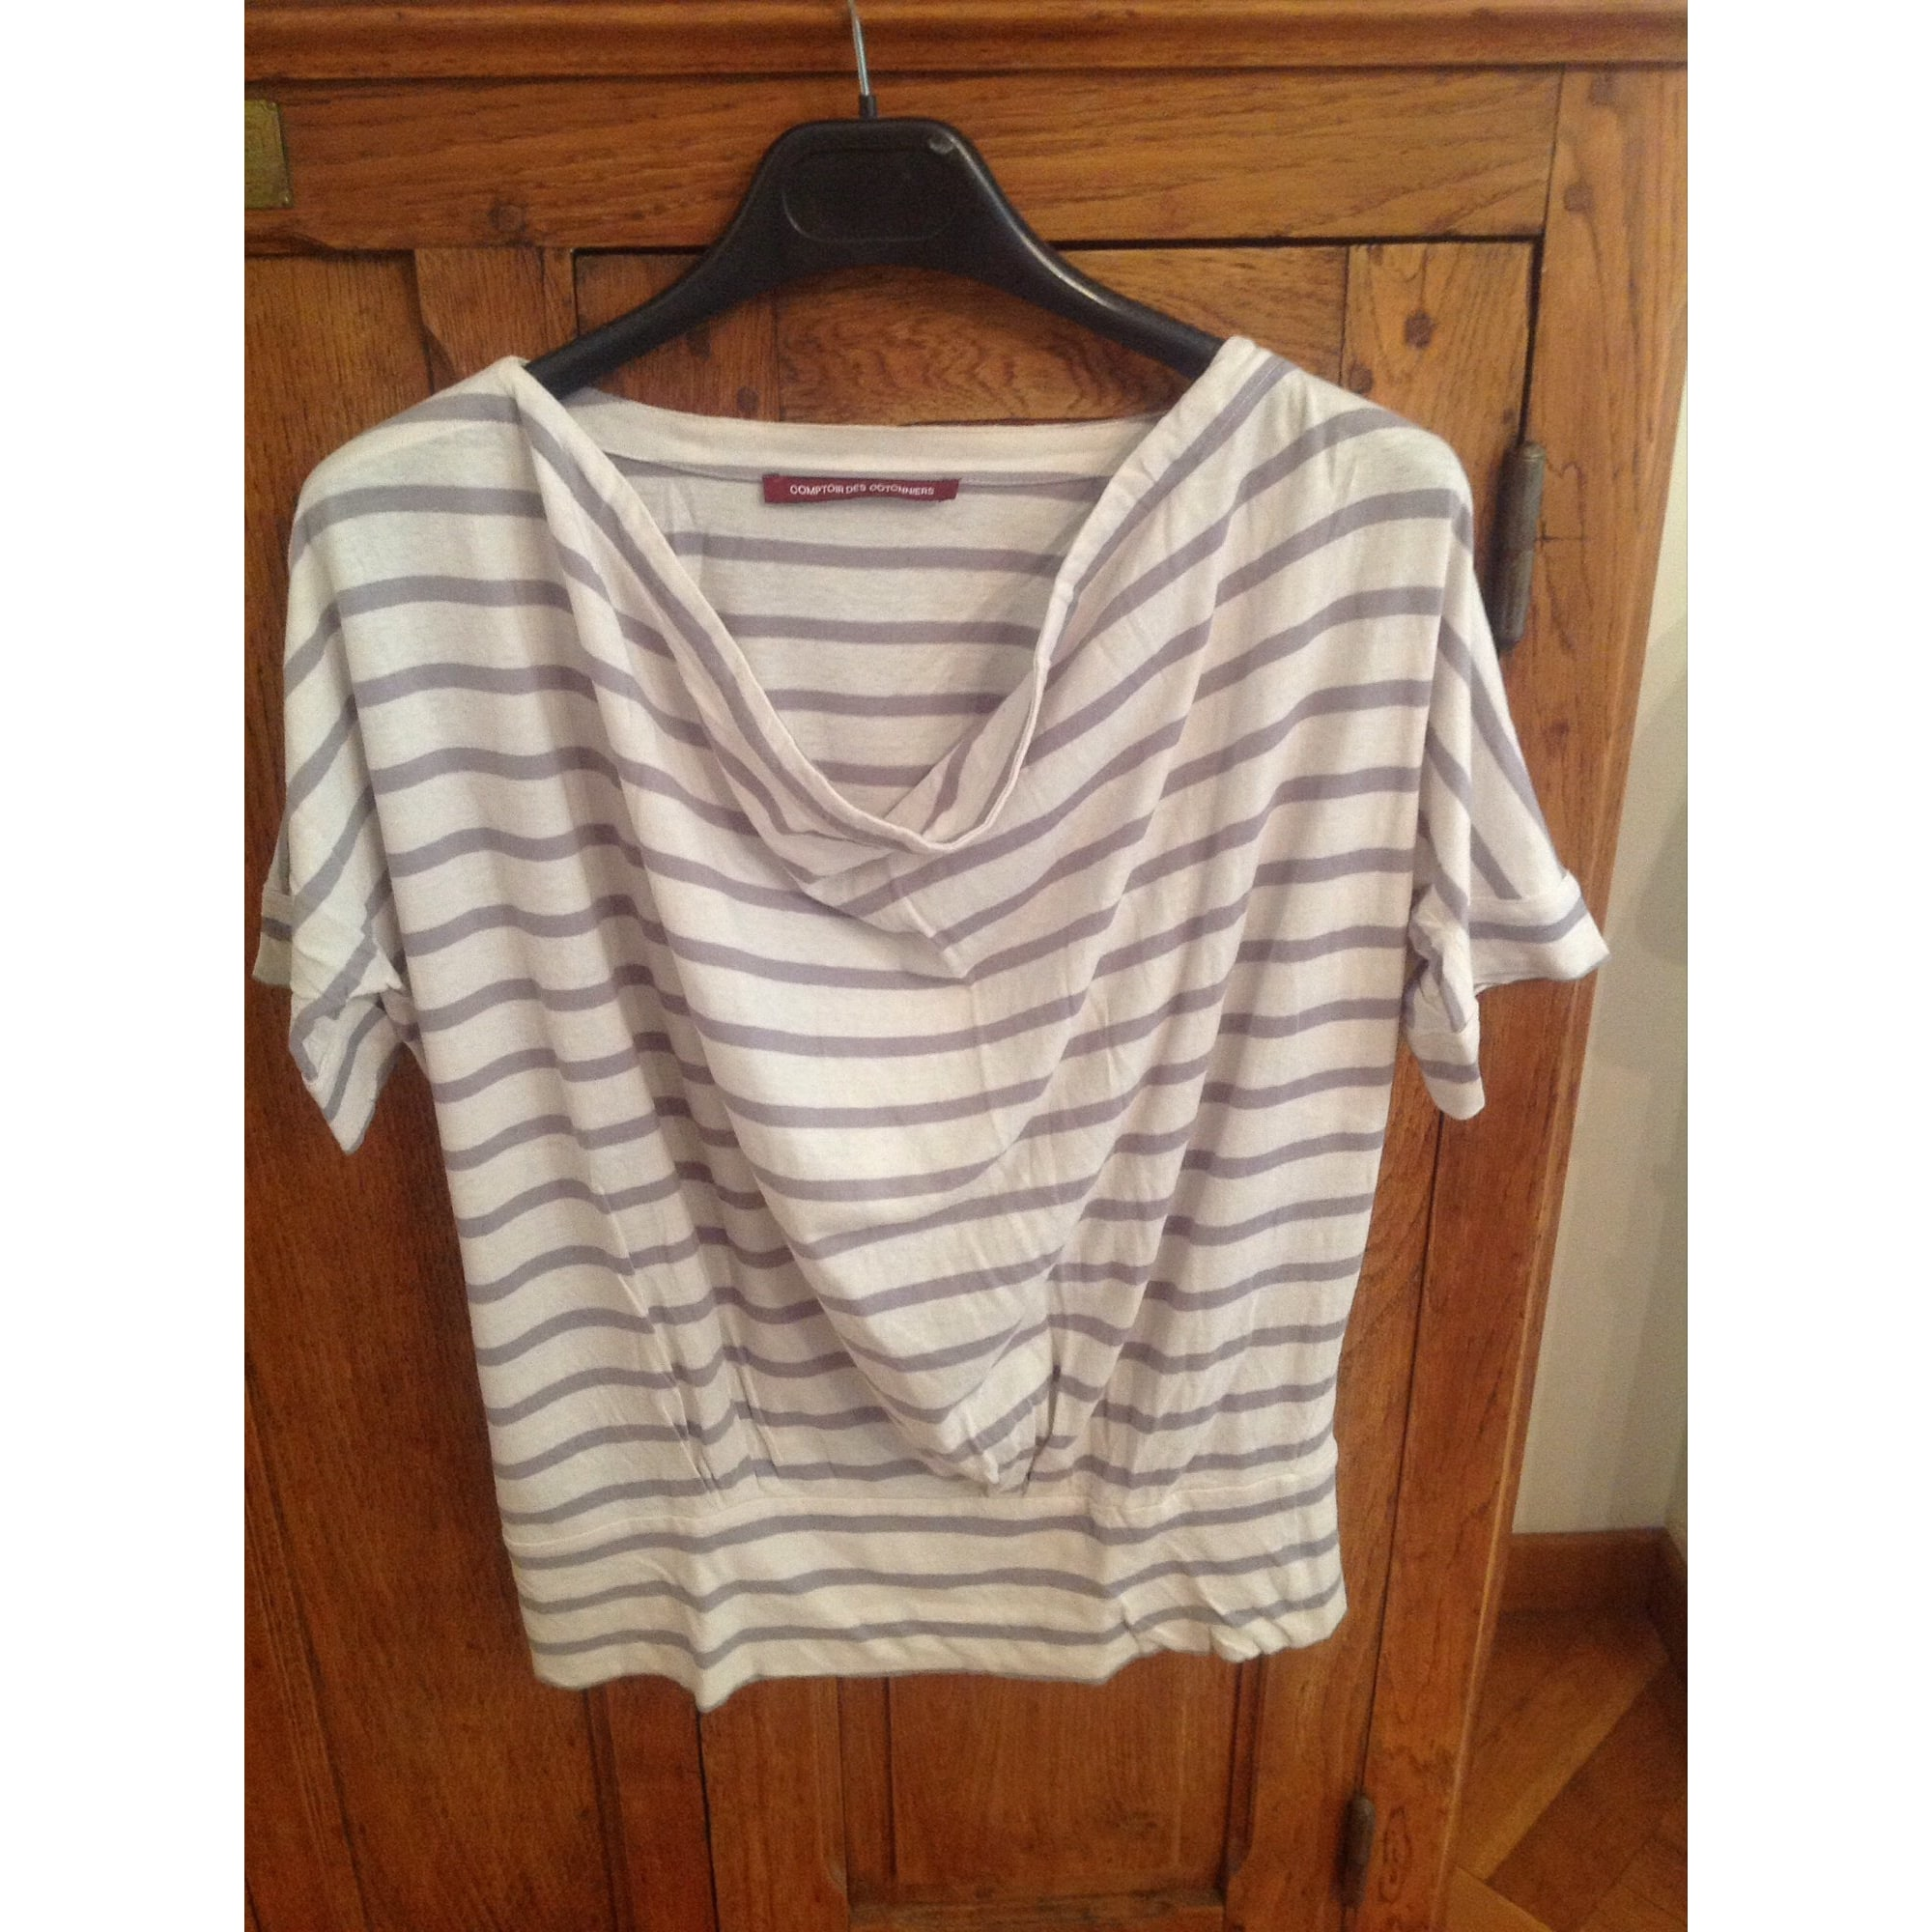 Top, tee-shirt COMPTOIR DES COTONNIERS Rayé blanc/gris